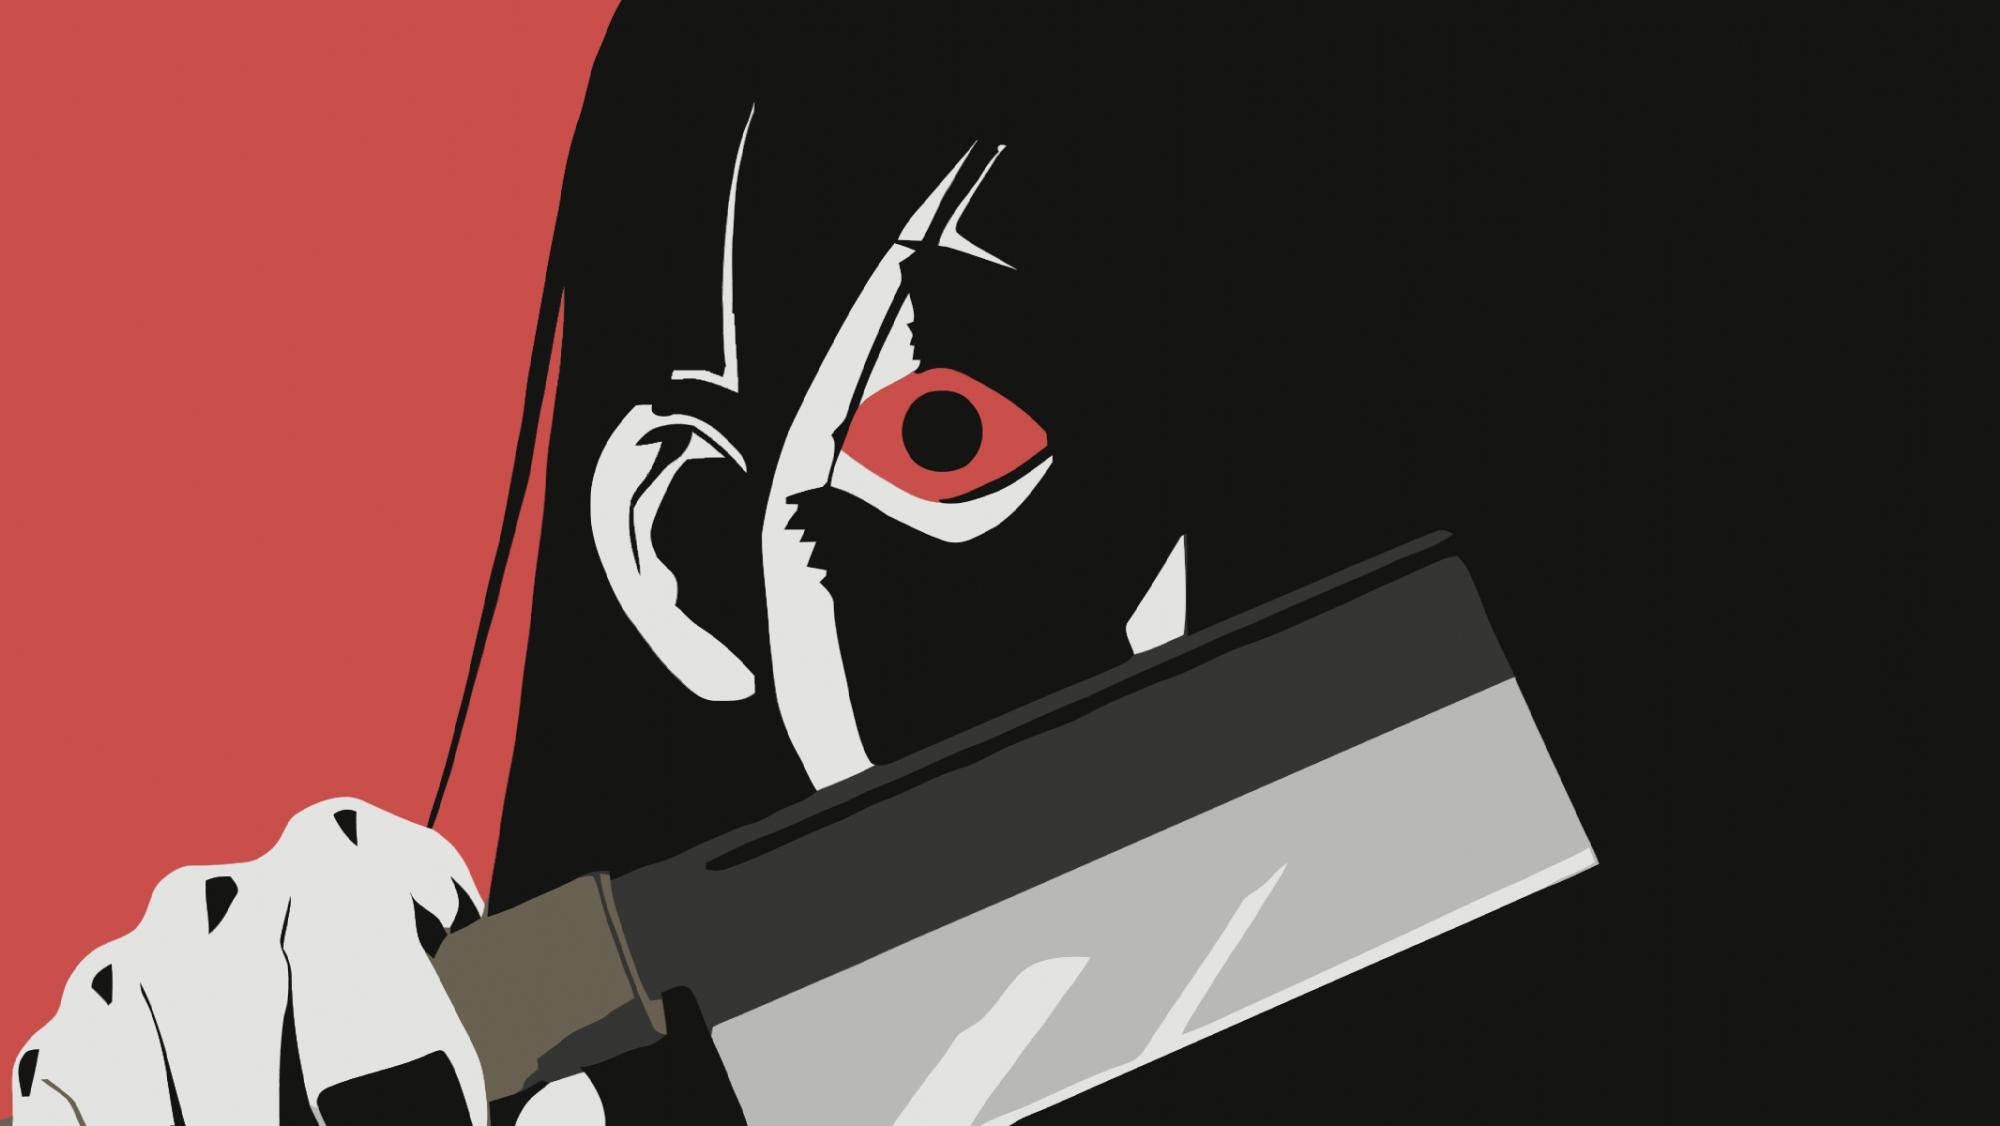 black_hair close kitsu_chiri knife red_eyes sayonara_zetsubou_sensei weapon